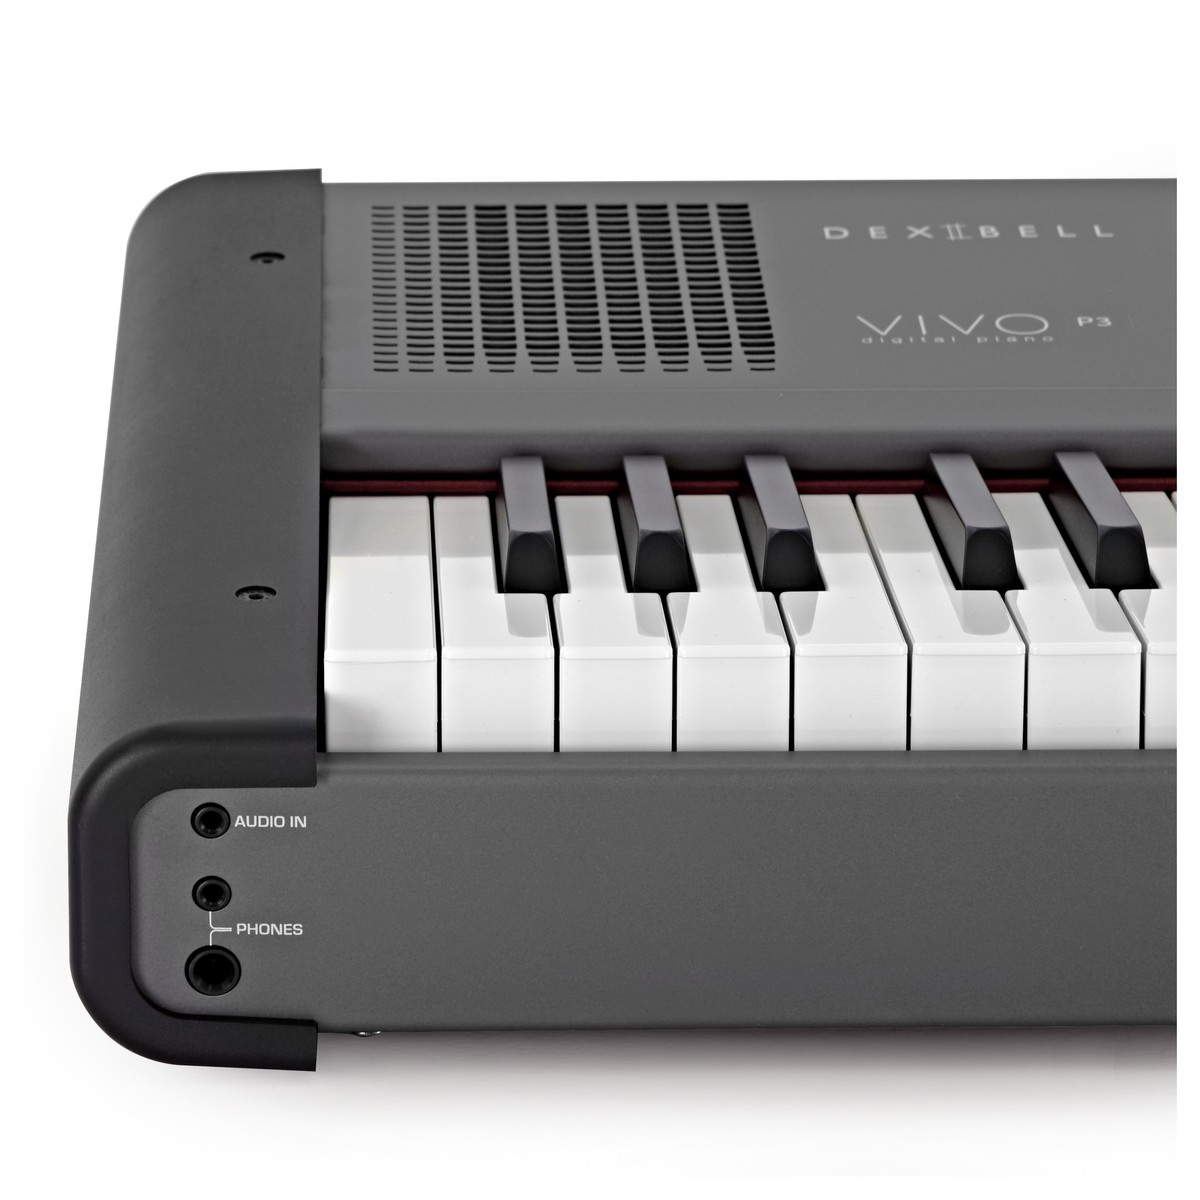 Re-thinking My Approach        - Piano World Piano & Digital